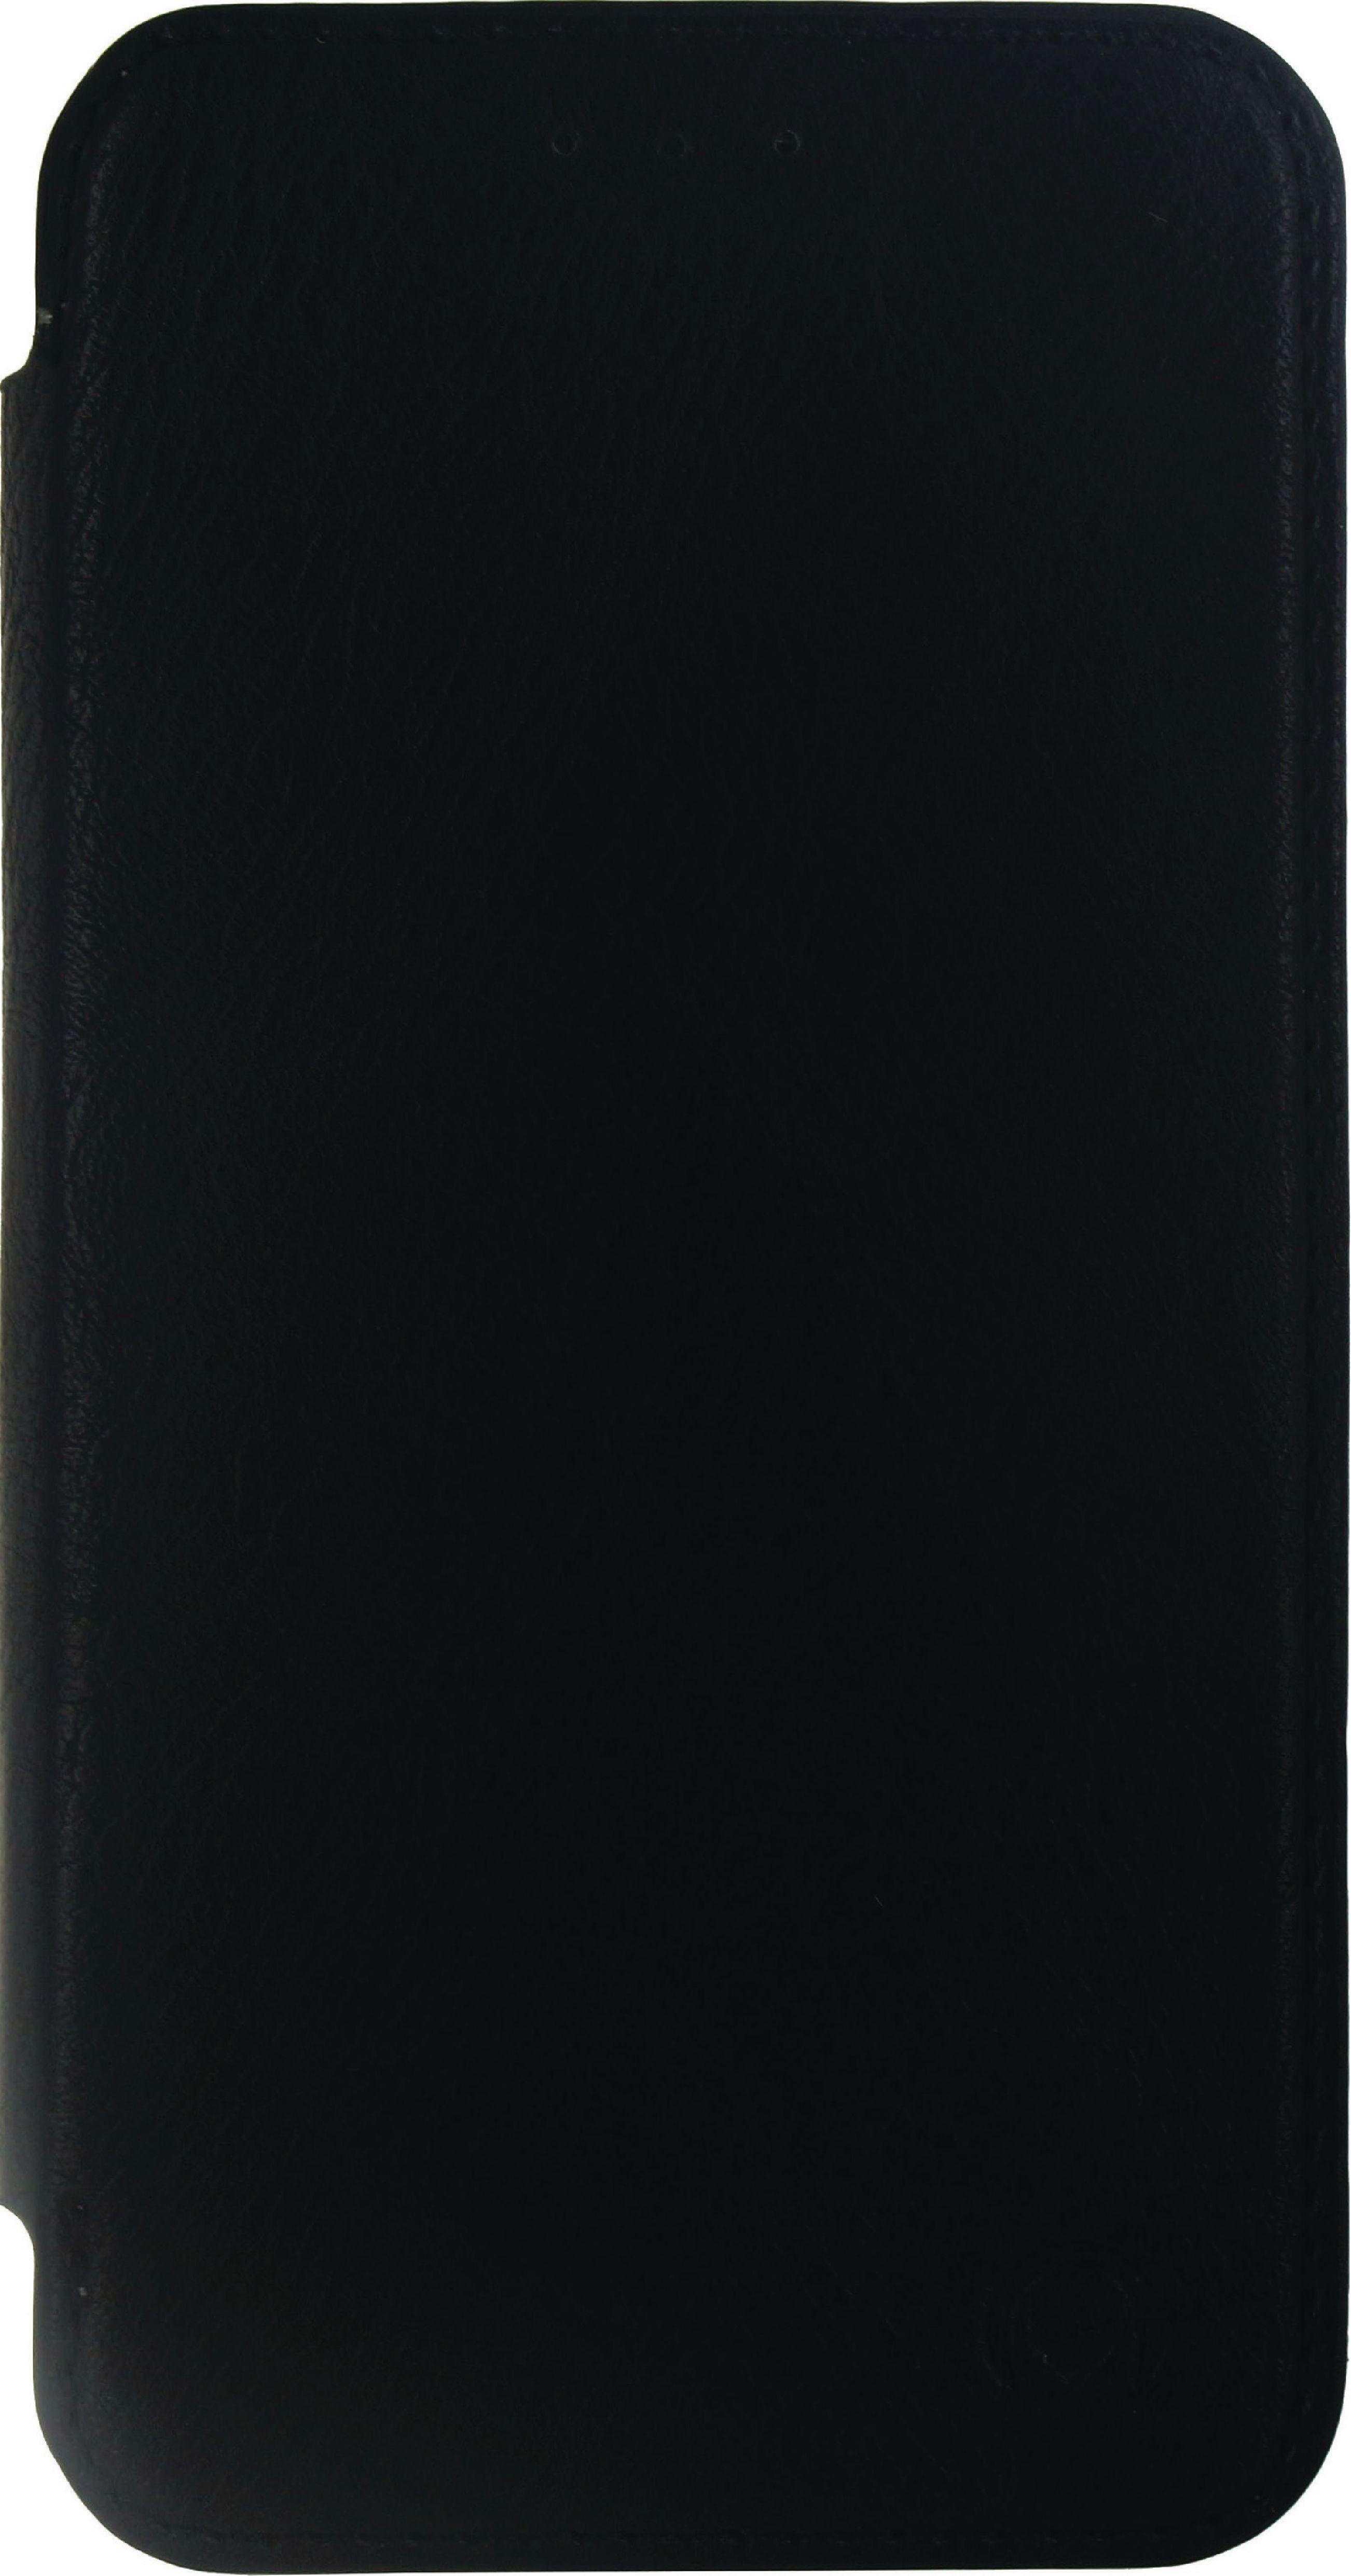 Image of   Telefon Slankt Bogetui Samsung Galaxy J5 Sort